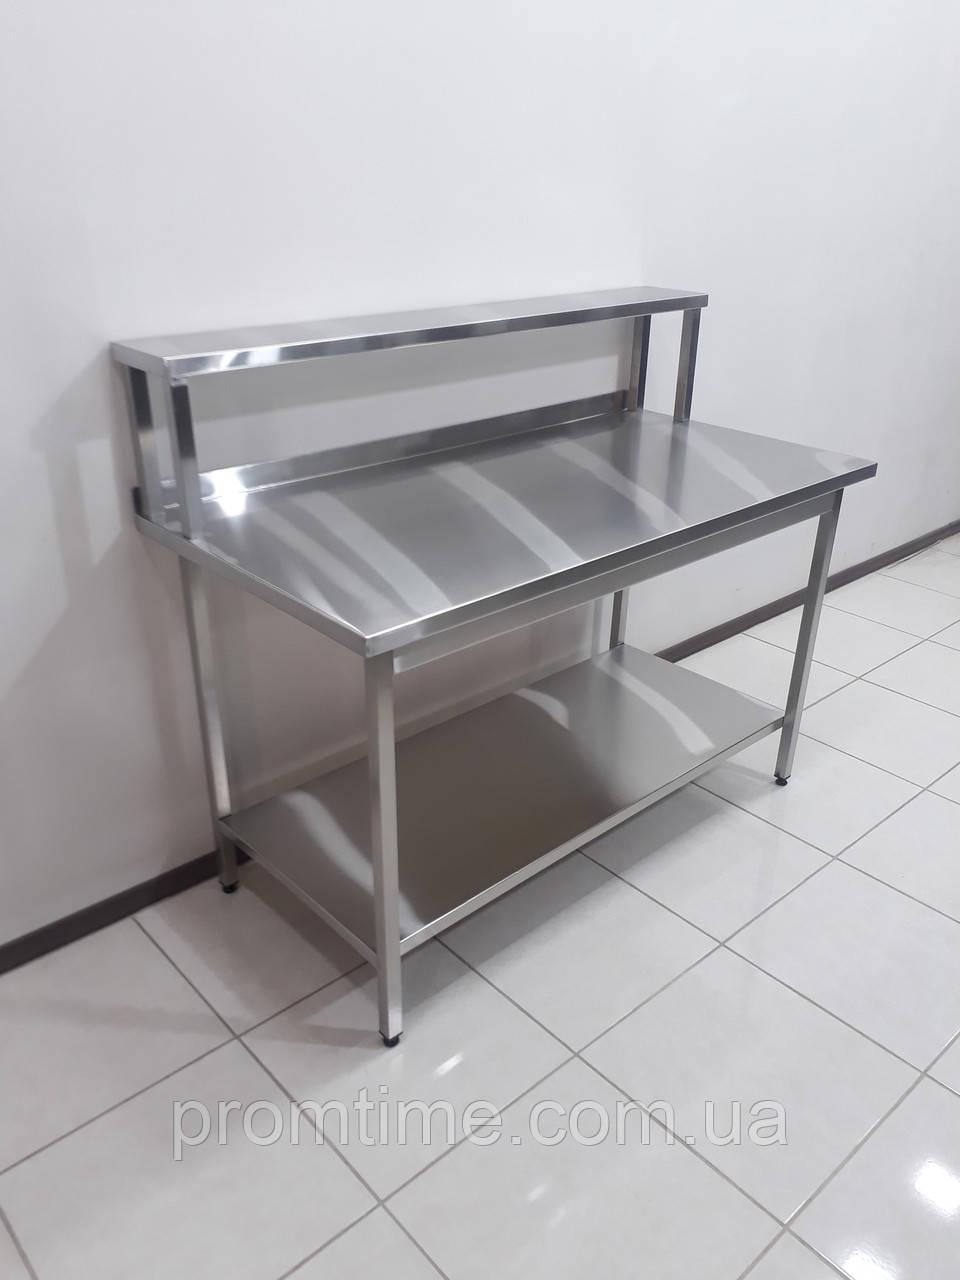 Стол производственный c полкой-надстройкой 1400х700х1150